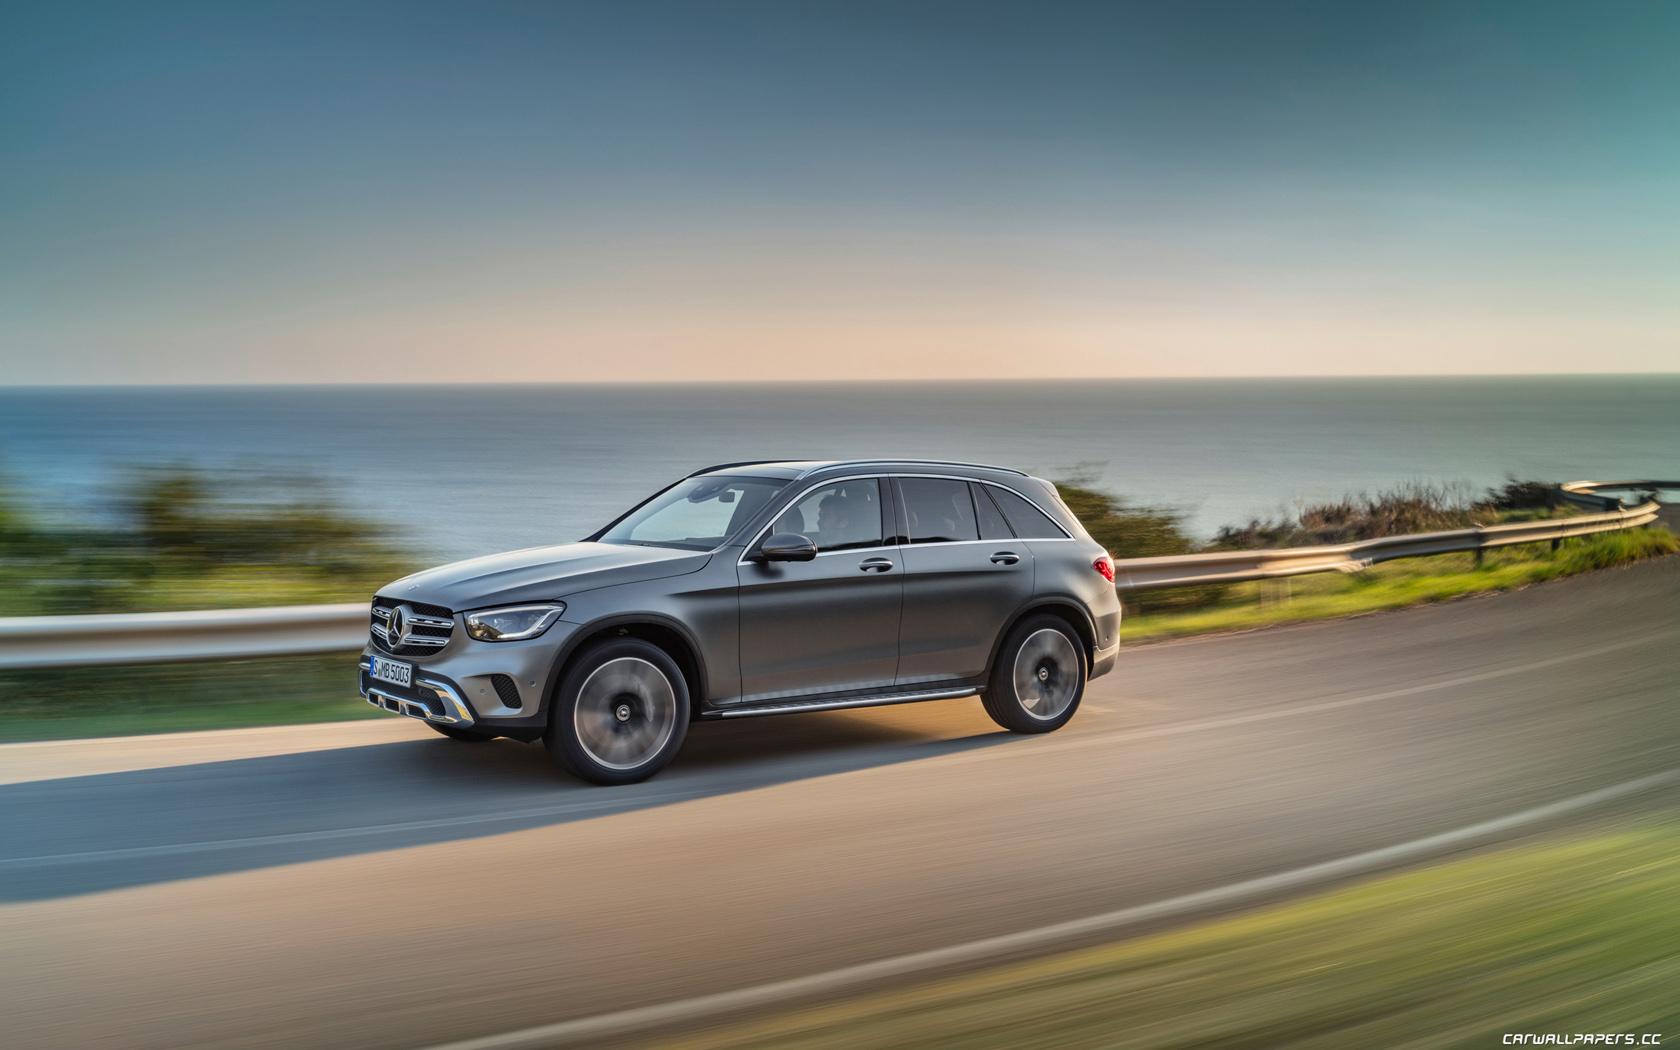 Cars desktop wallpapers Mercedes-Benz GLC 300 4MATIC - 2019